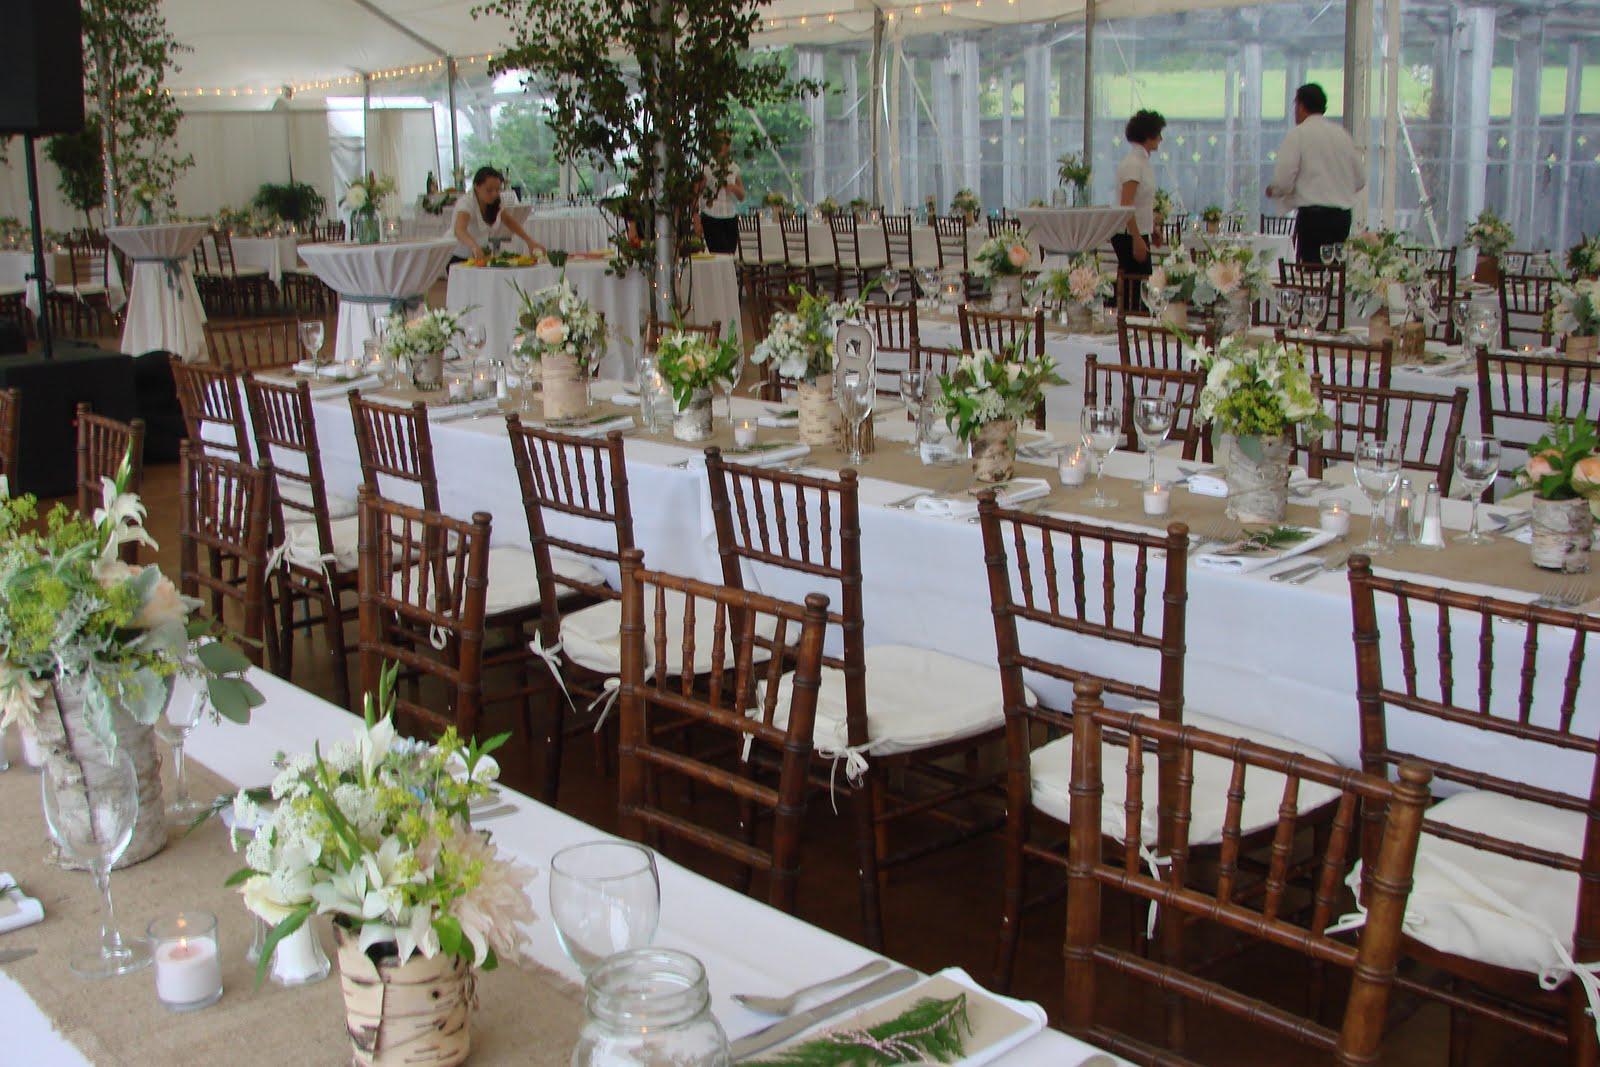 tiffany wedding chairs vinyl chair cushions scott martin  july 10 2010